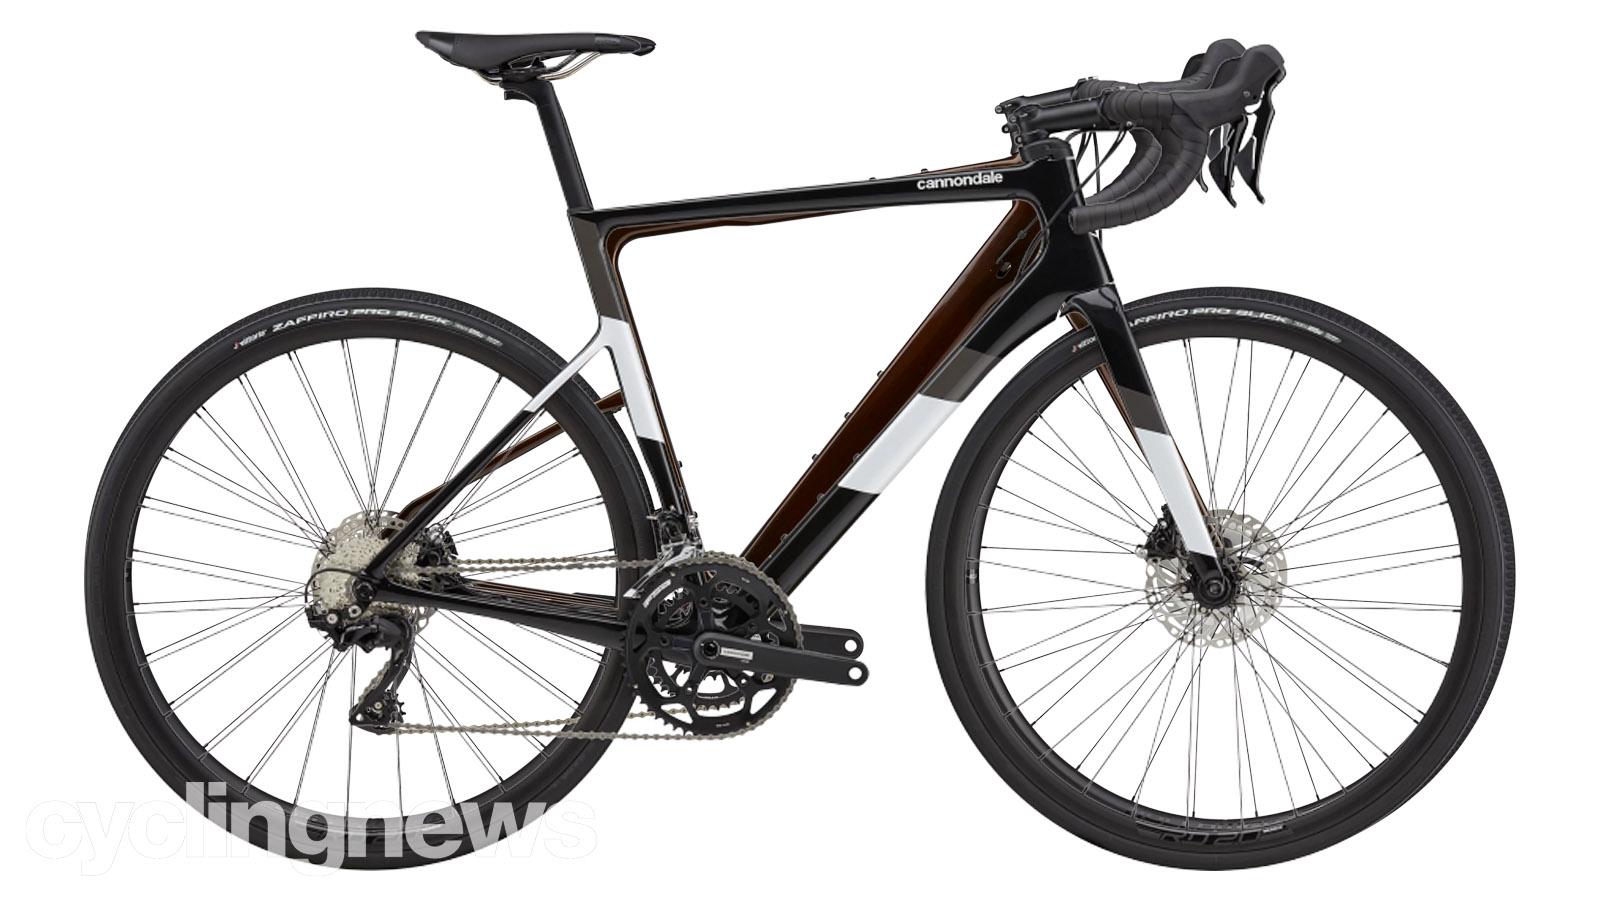 Road bike vs gravel bike: Geometry